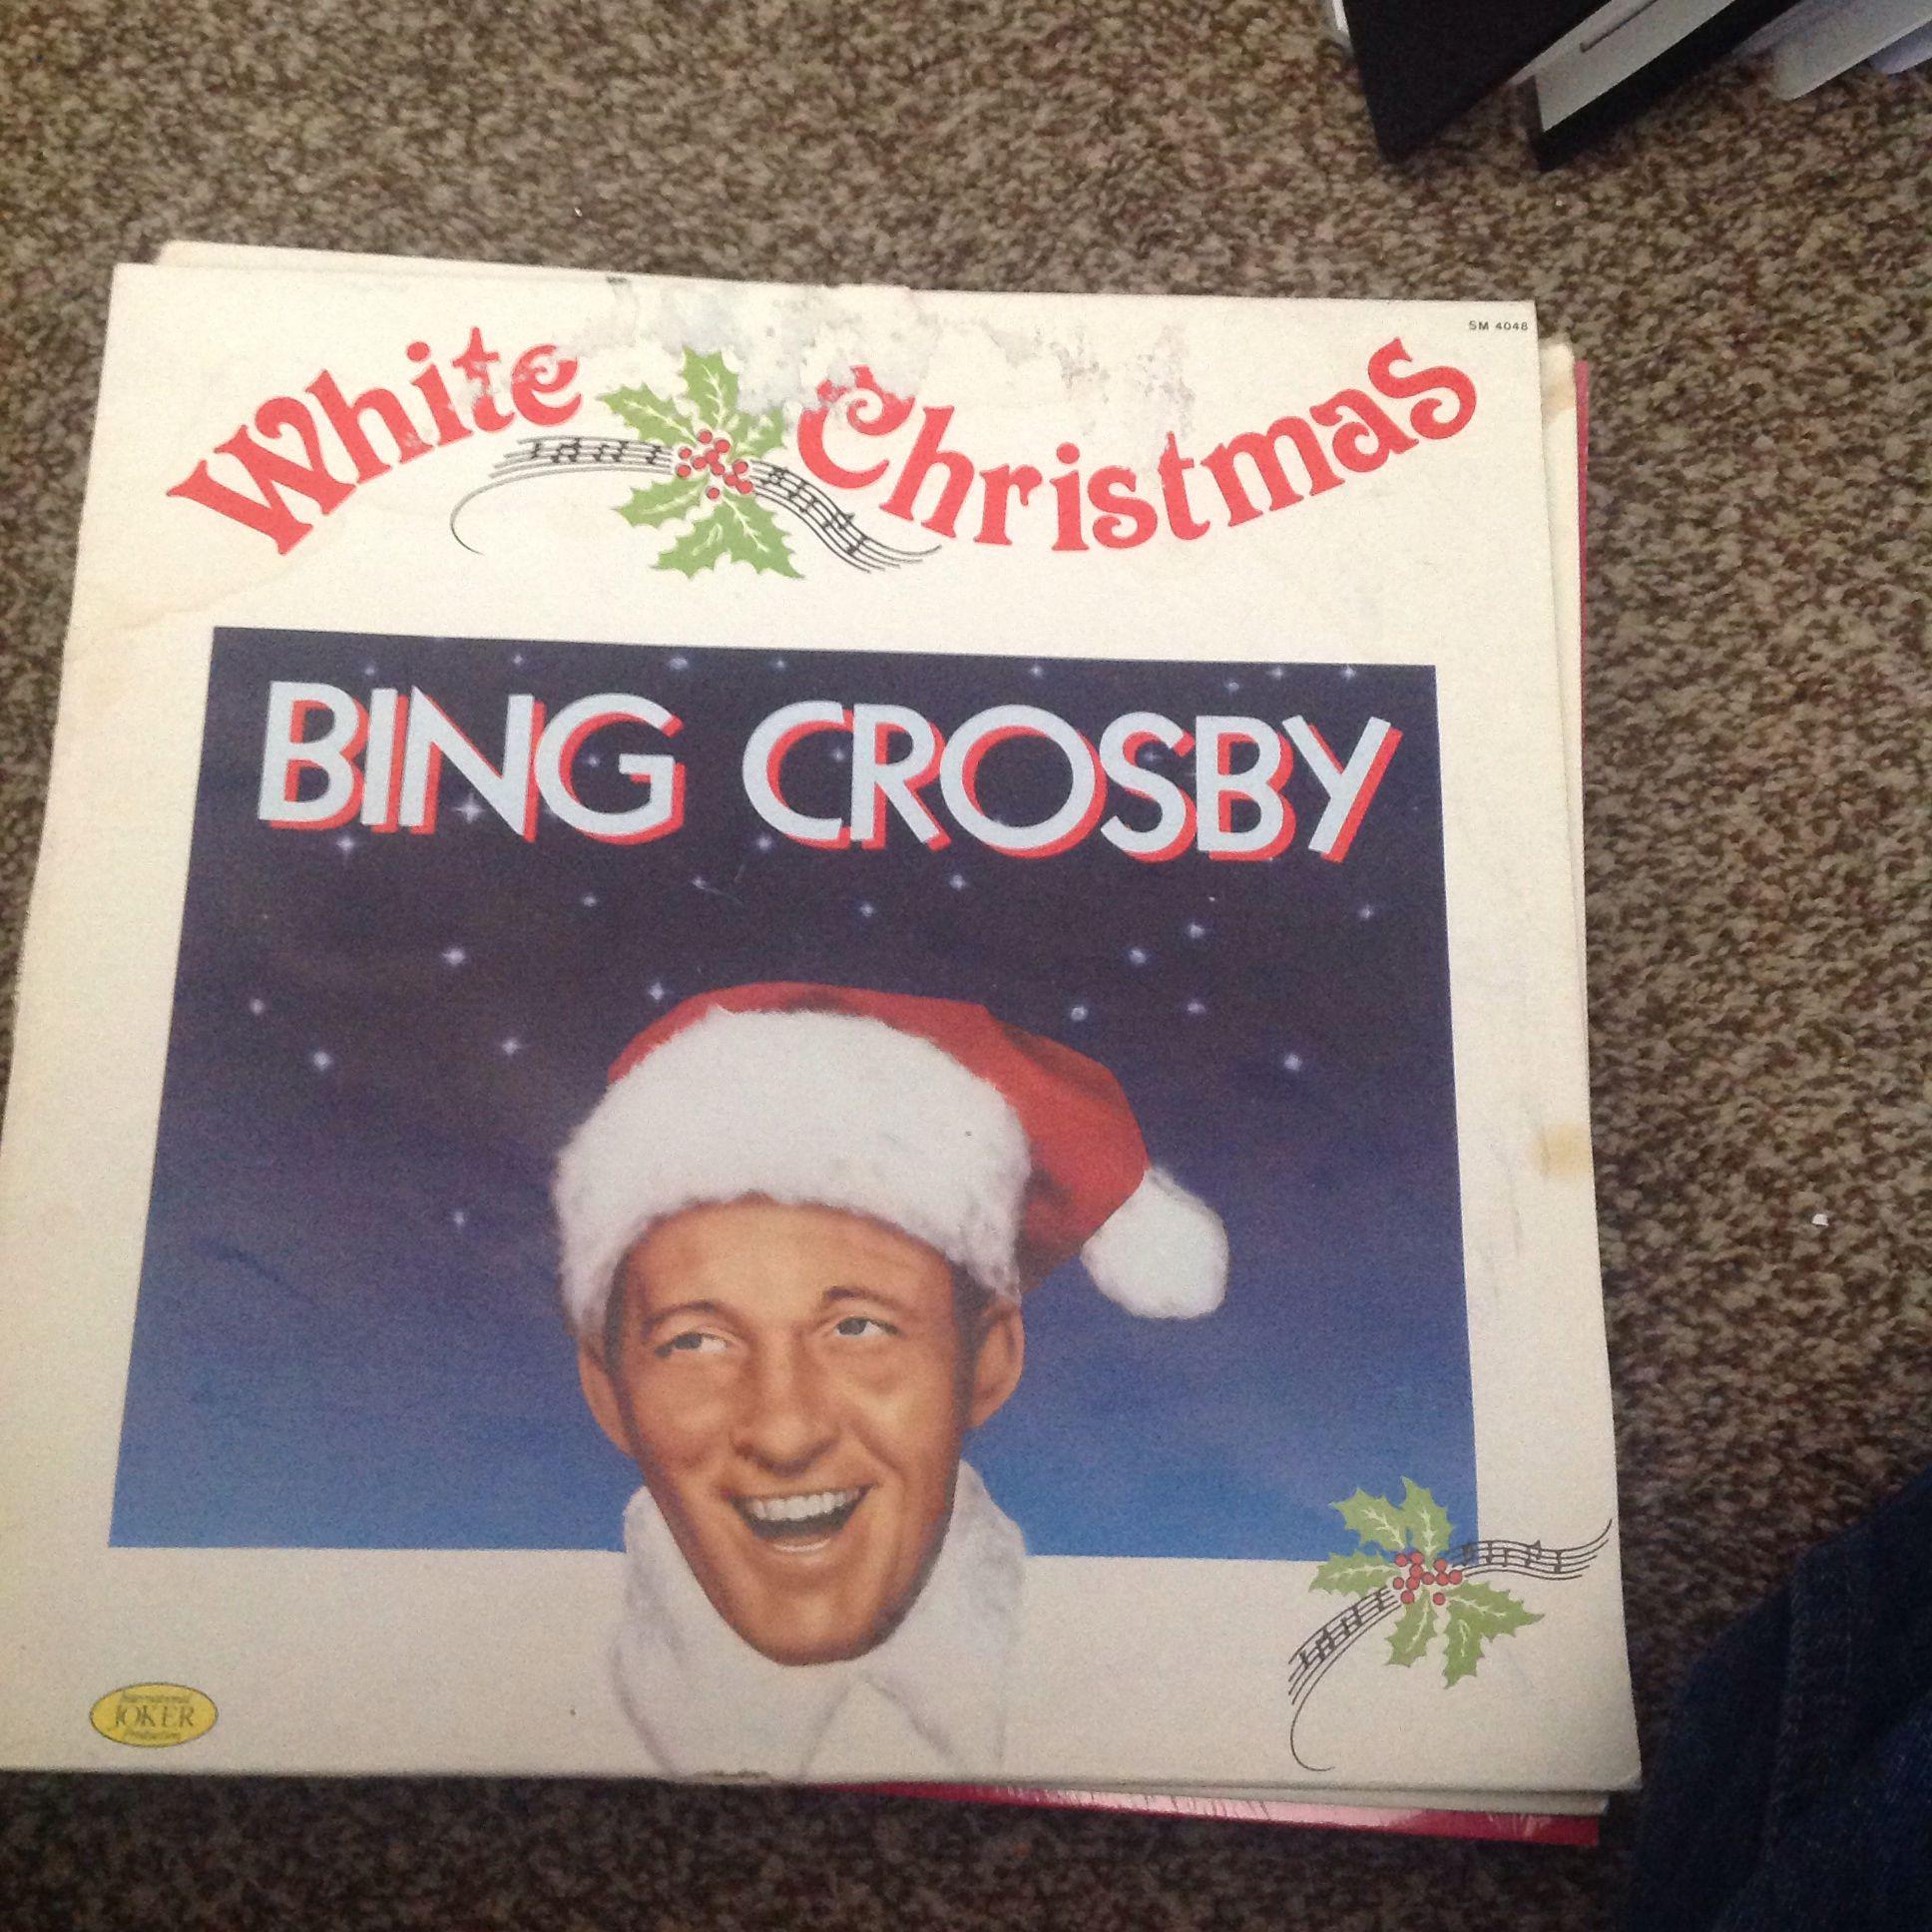 White christmas bing crosby Bing crosby, Crosby, Record